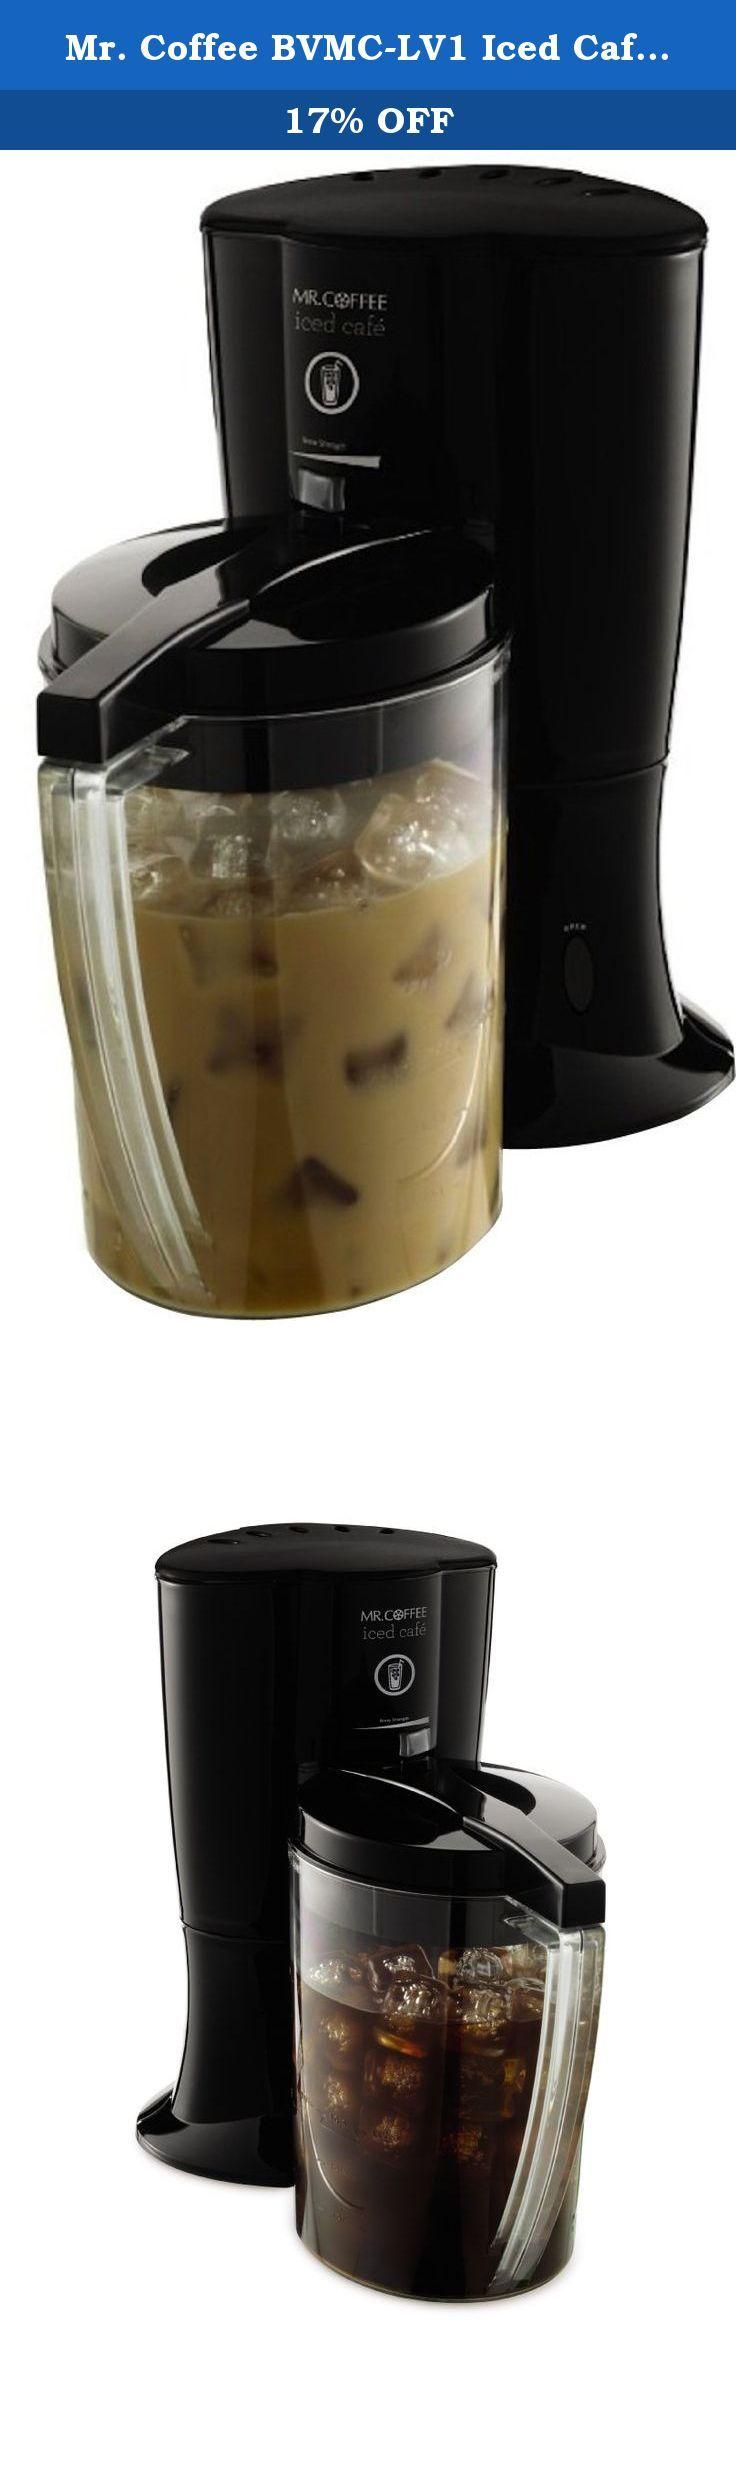 Mr. Coffee BVMC-LV1 Iced Cafe Iced Coffee Maker, Black. Mr ...